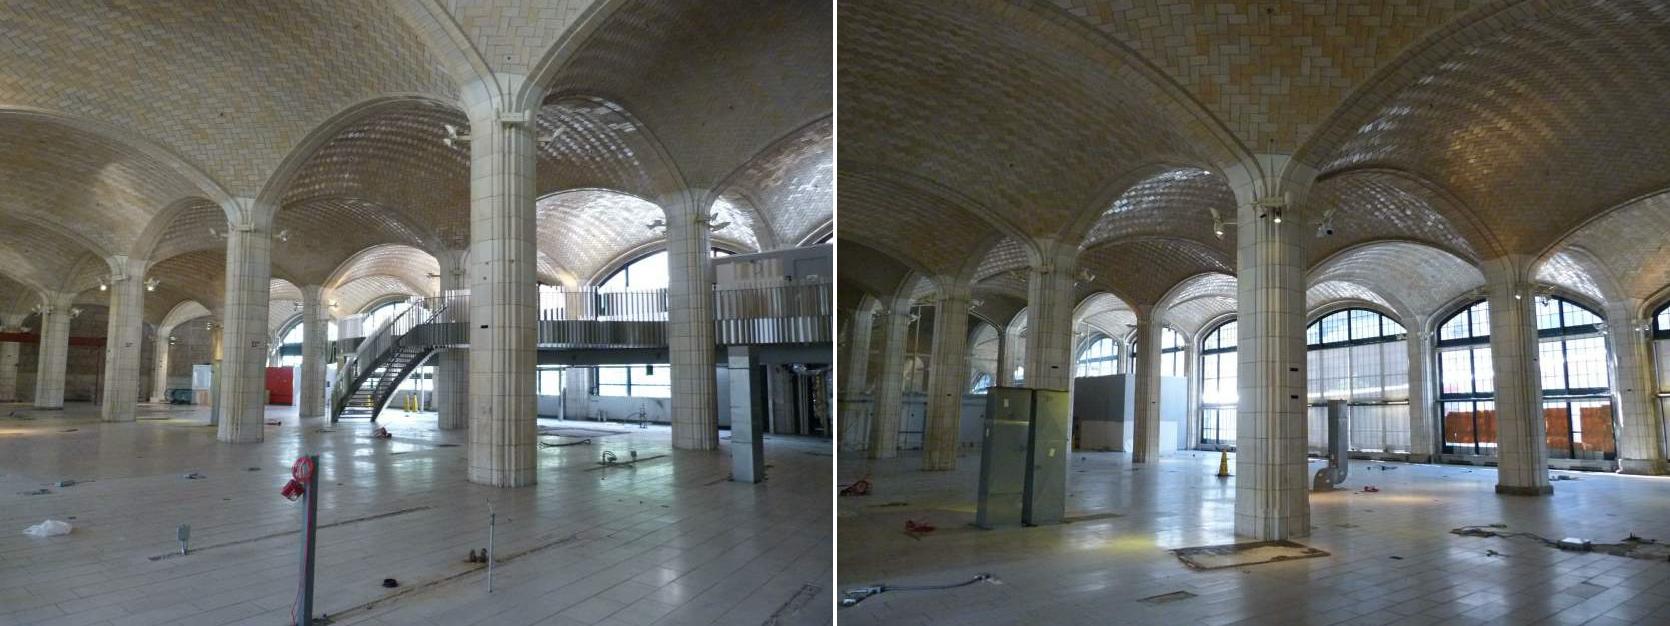 The space under the Queensboro Bridge following the closing of the Food Emporium